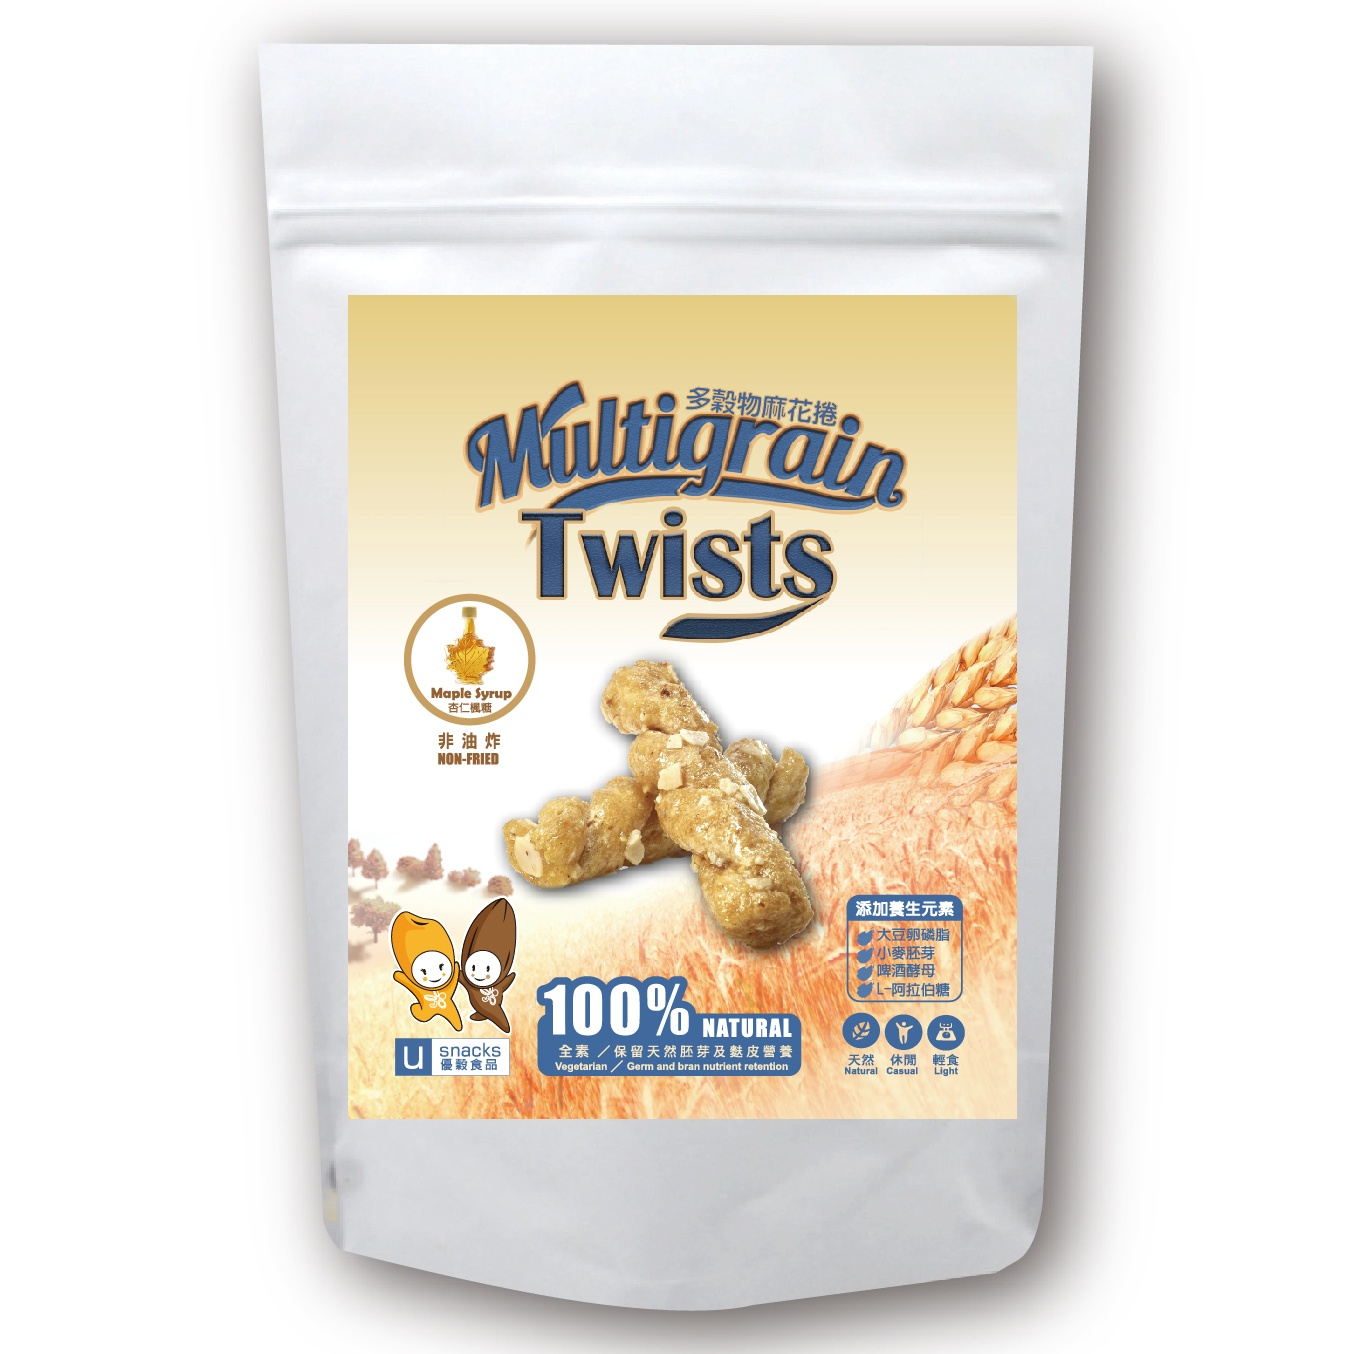 Multigrain Twists (Maple syrup)